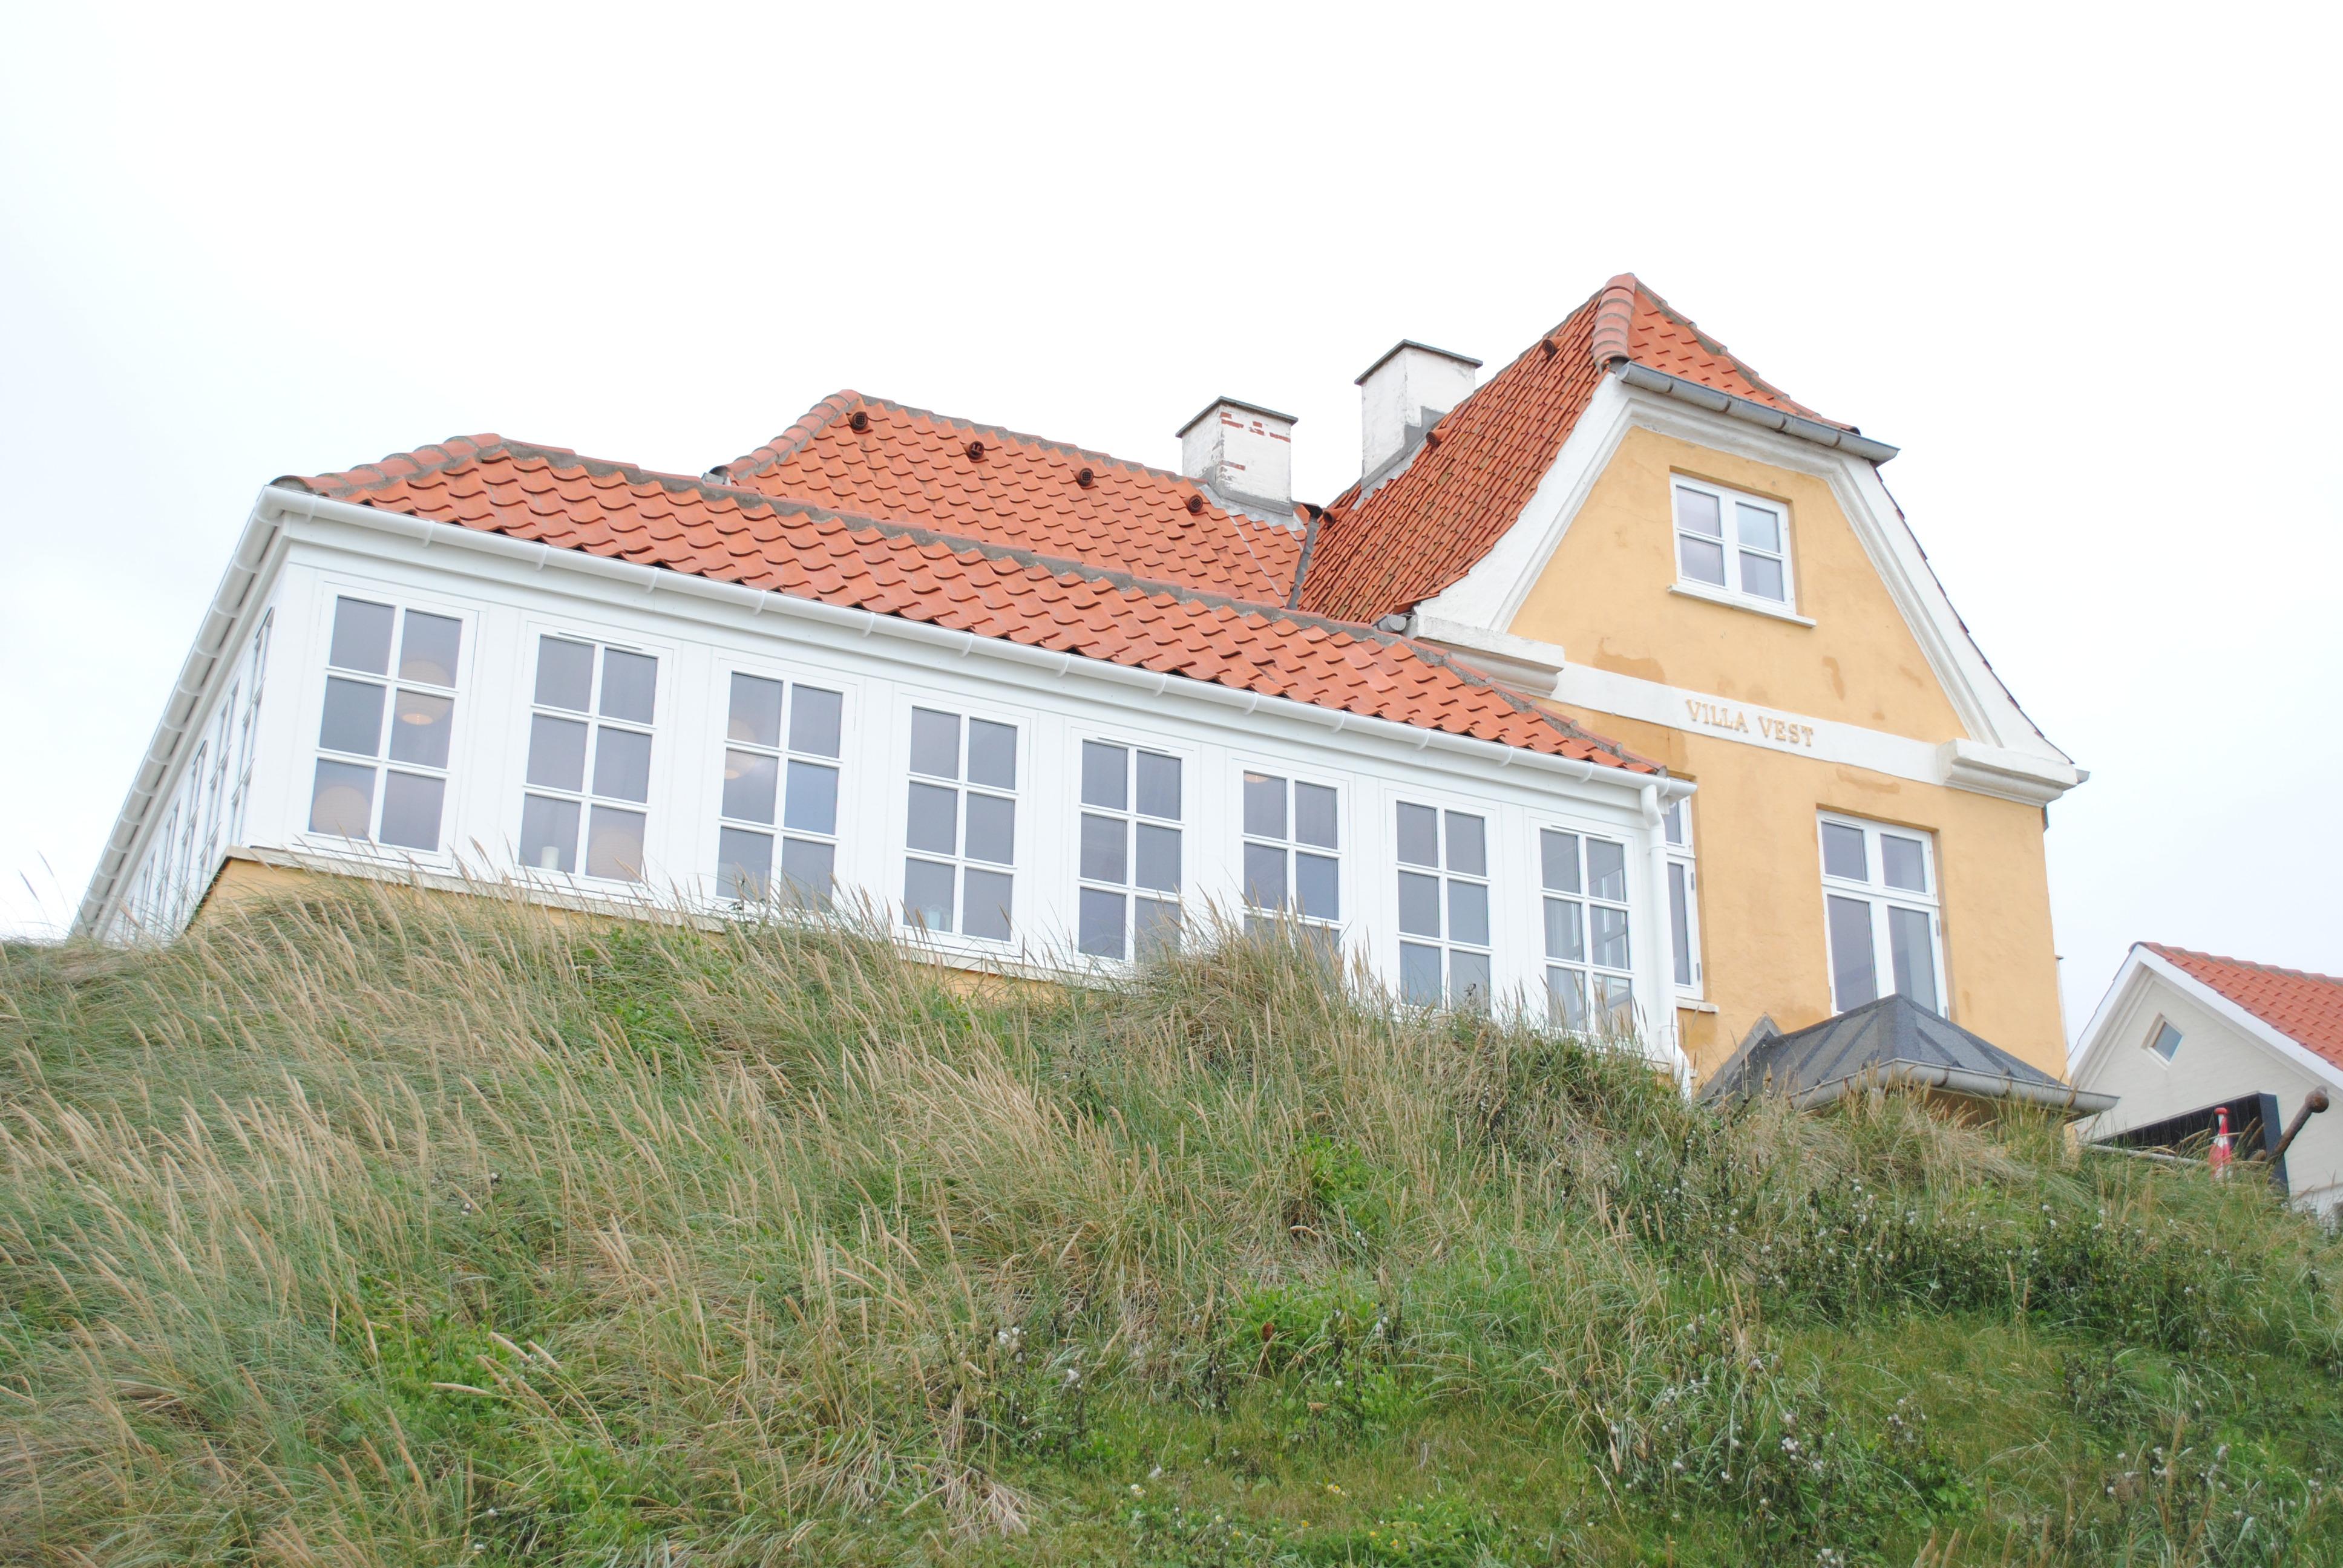 Villa Vest – Vesterhavets perle